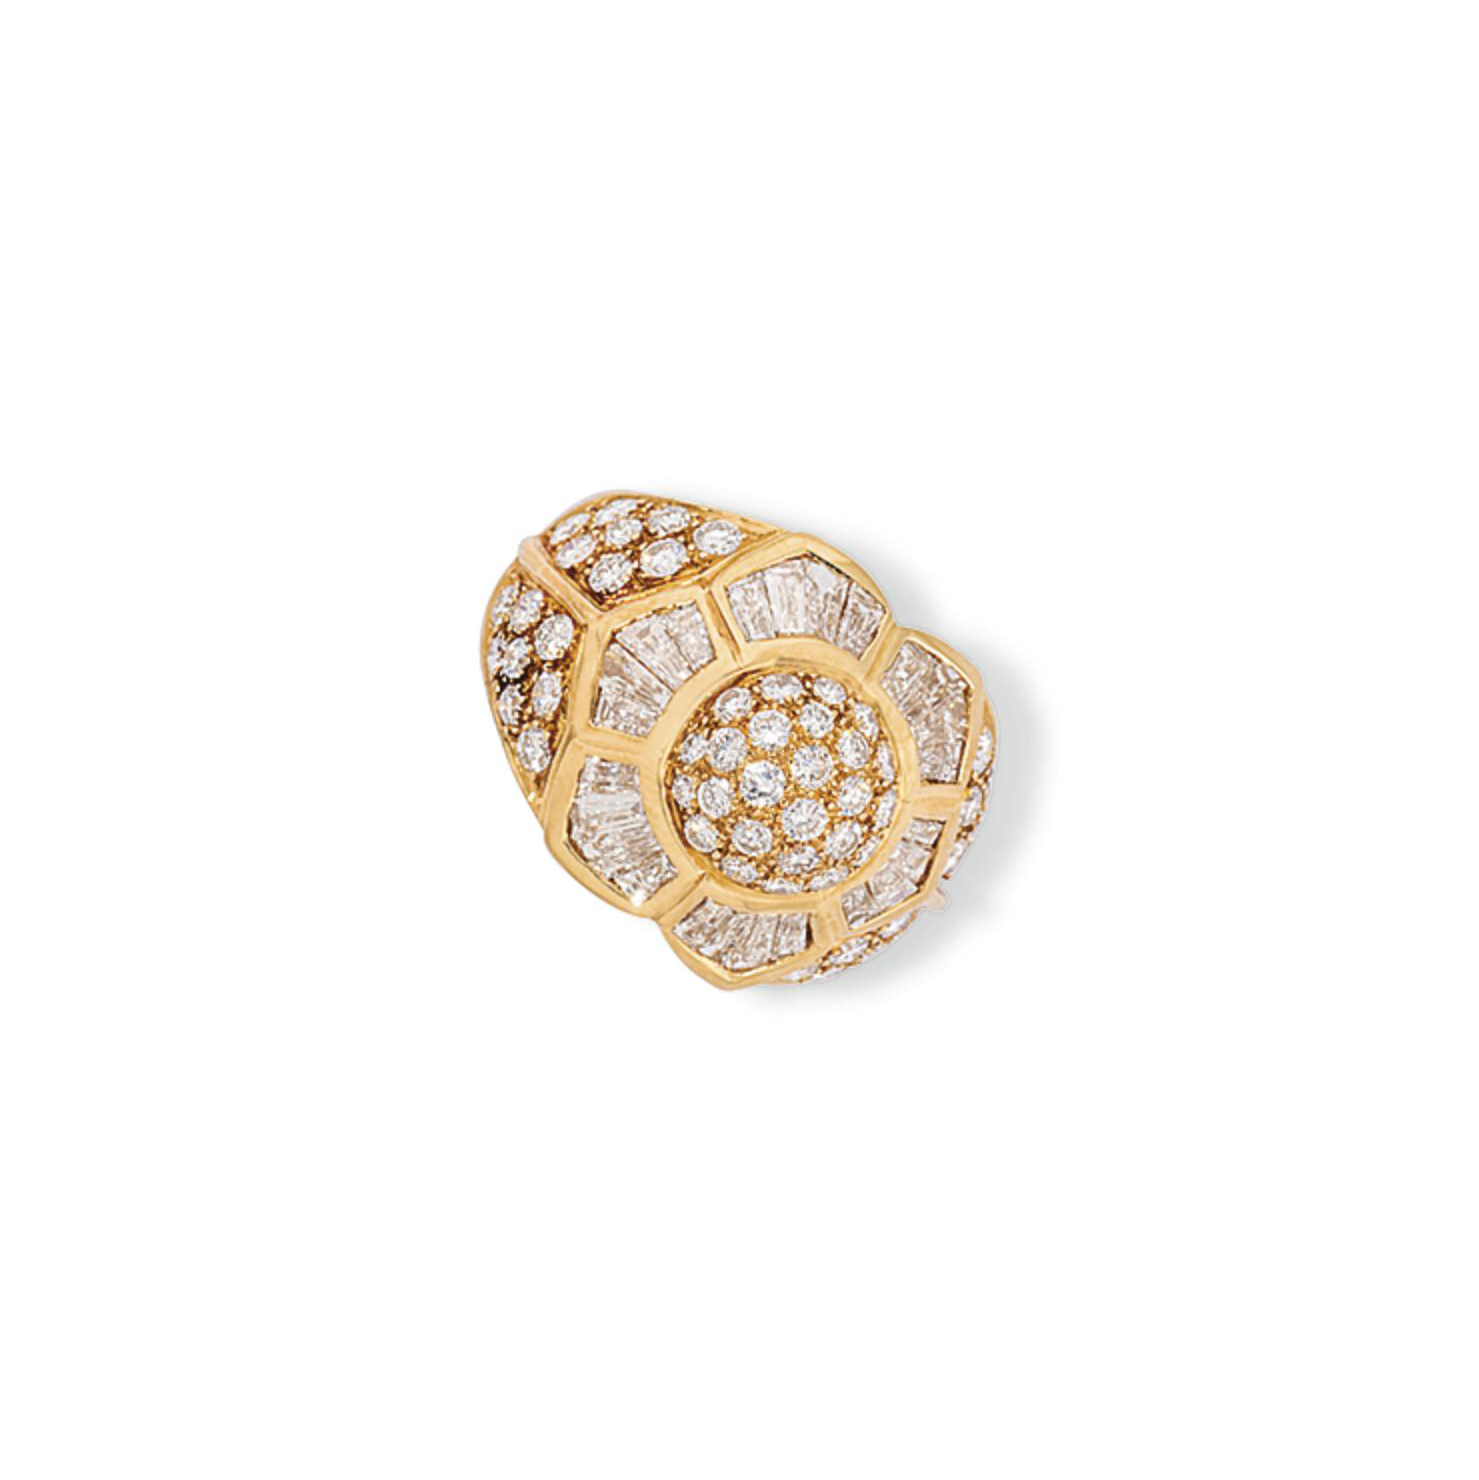 FIVE DIAMOND-SET DRESS RINGS AND ONE SAPPHIRE AND DIAMOND RI...